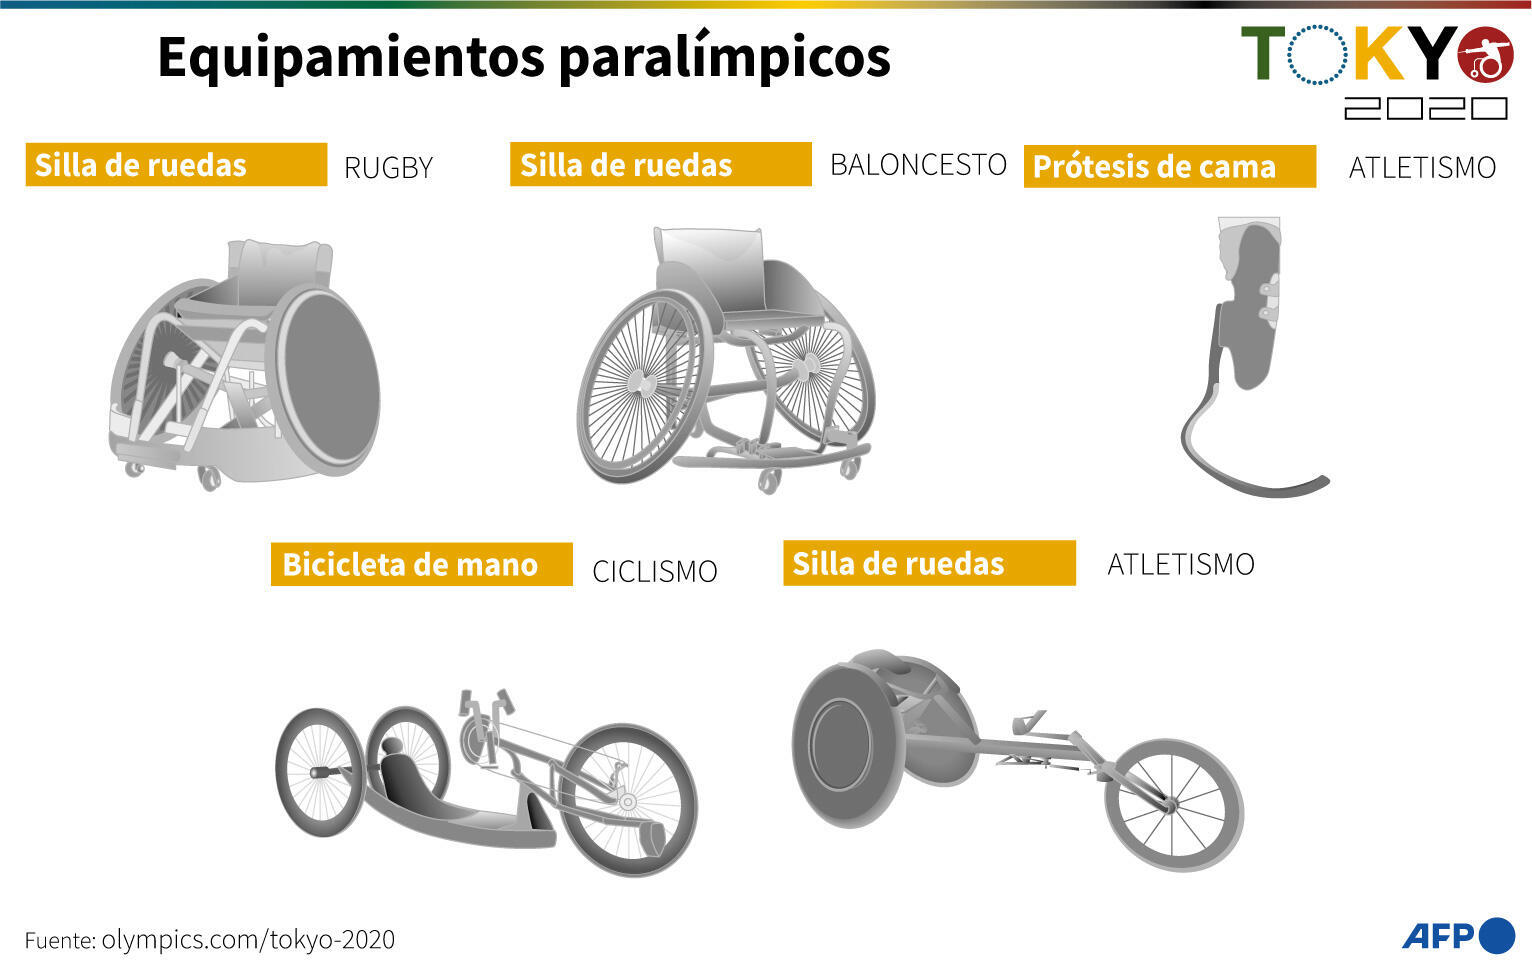 Paralympic equipment